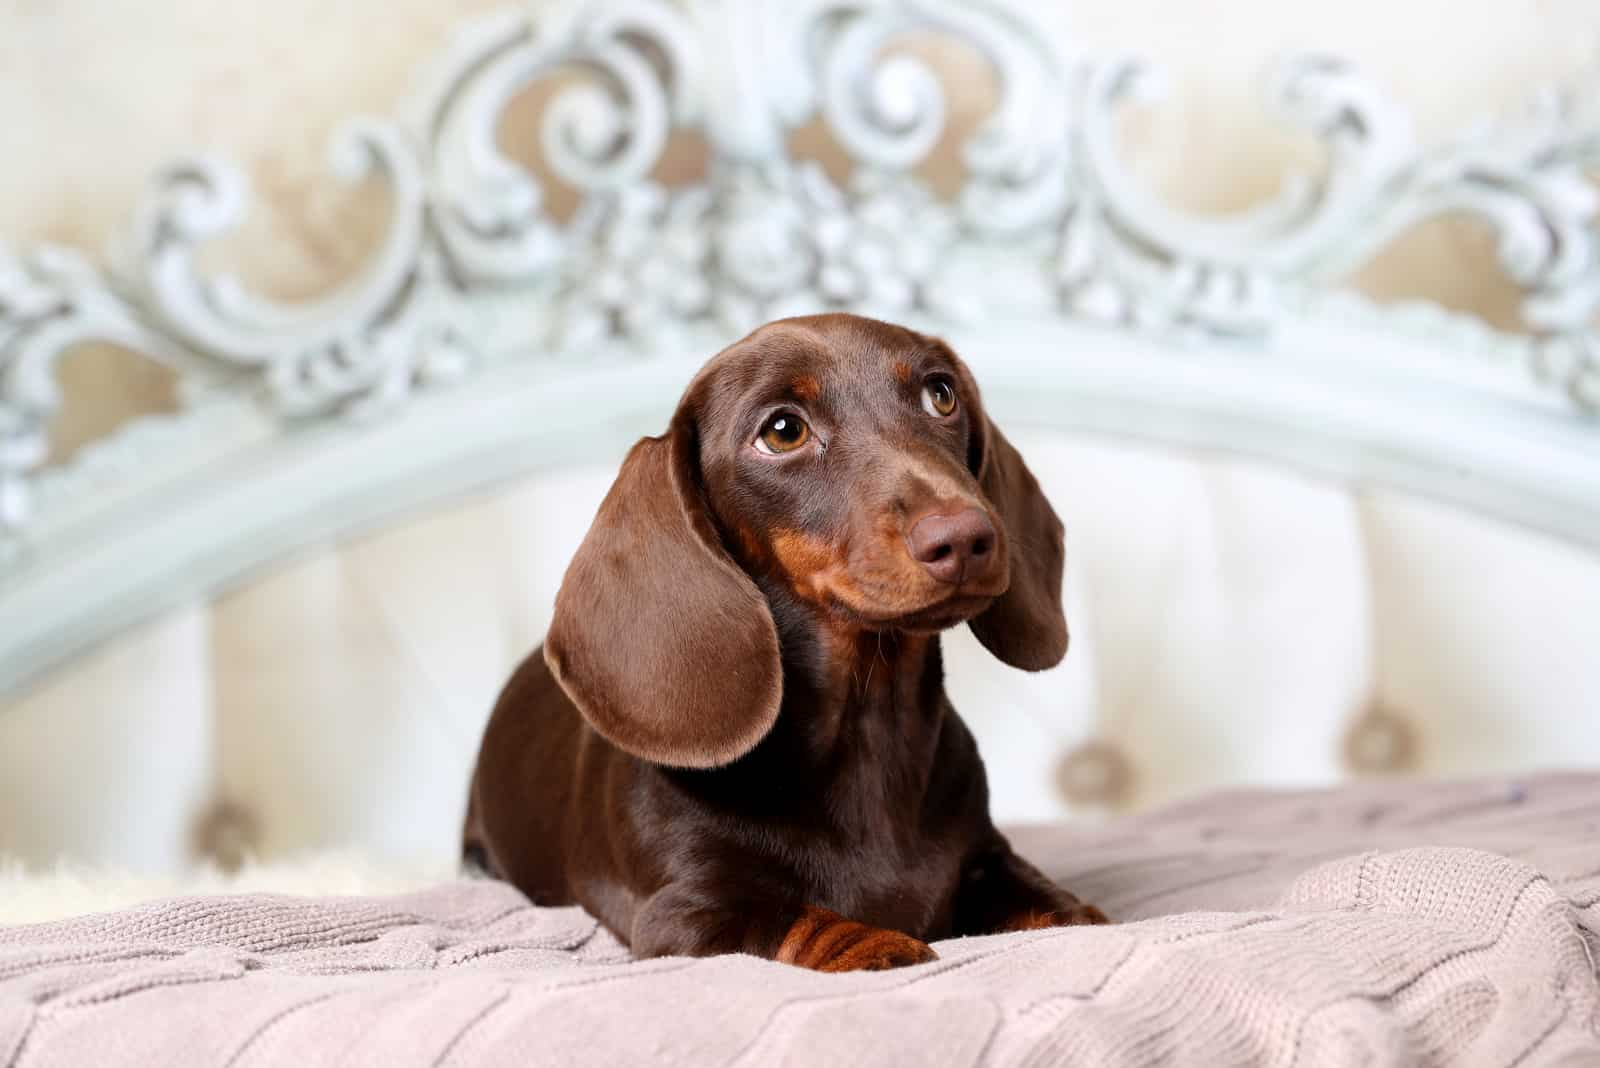 dachshund puppy lying in bed